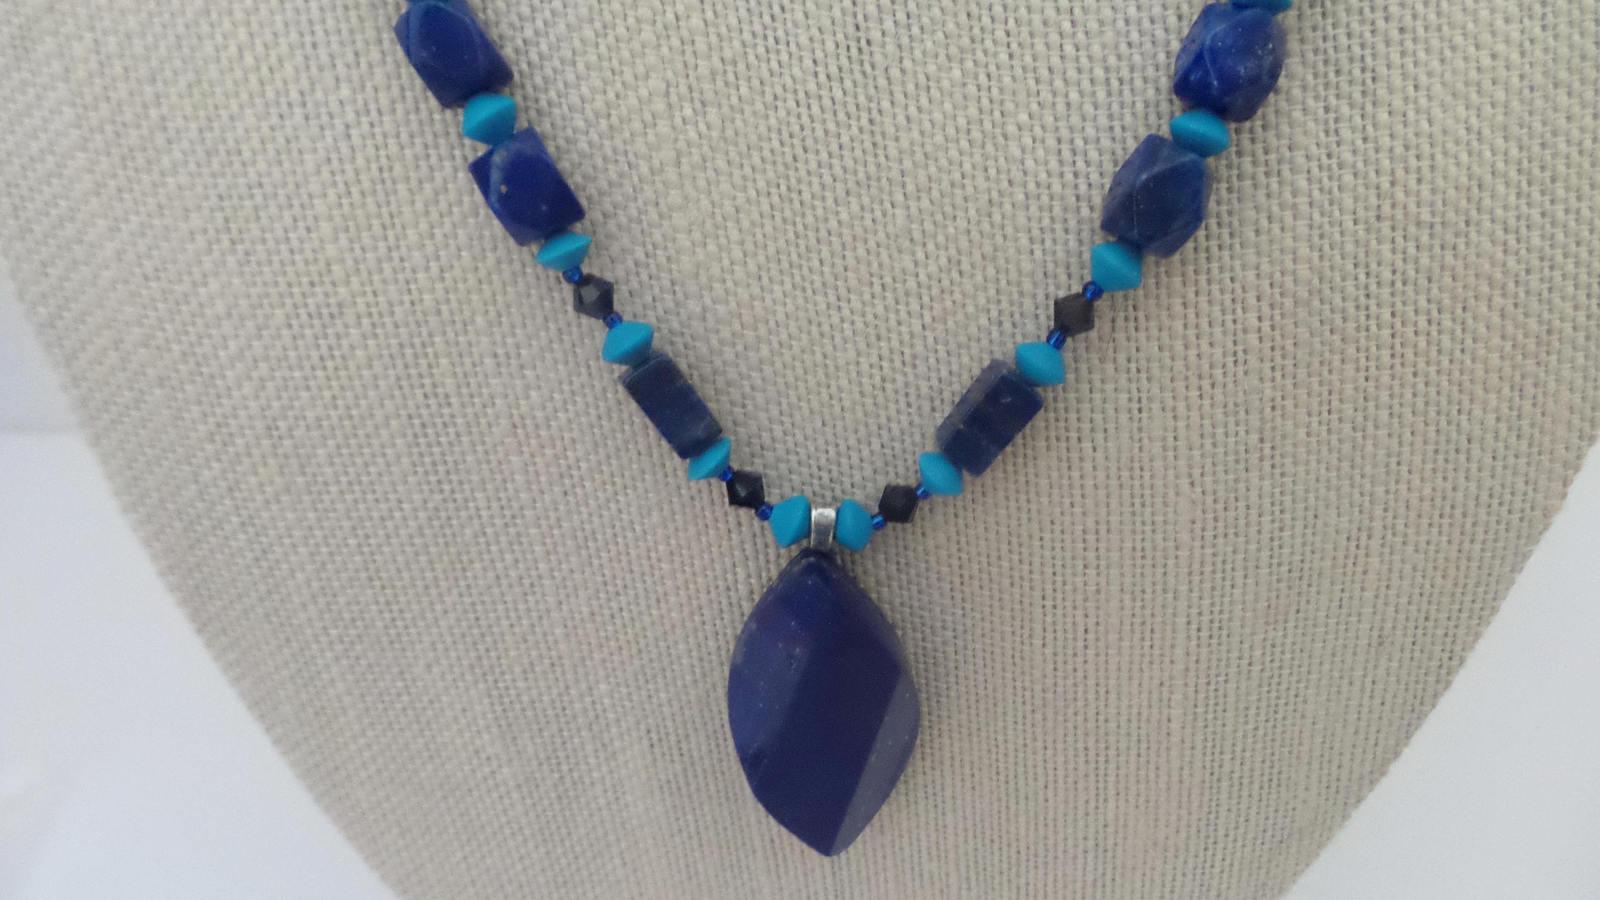 Sale! Lapis Pendant Turquoise Swarovski Necklace Earrings Sterling Handmade